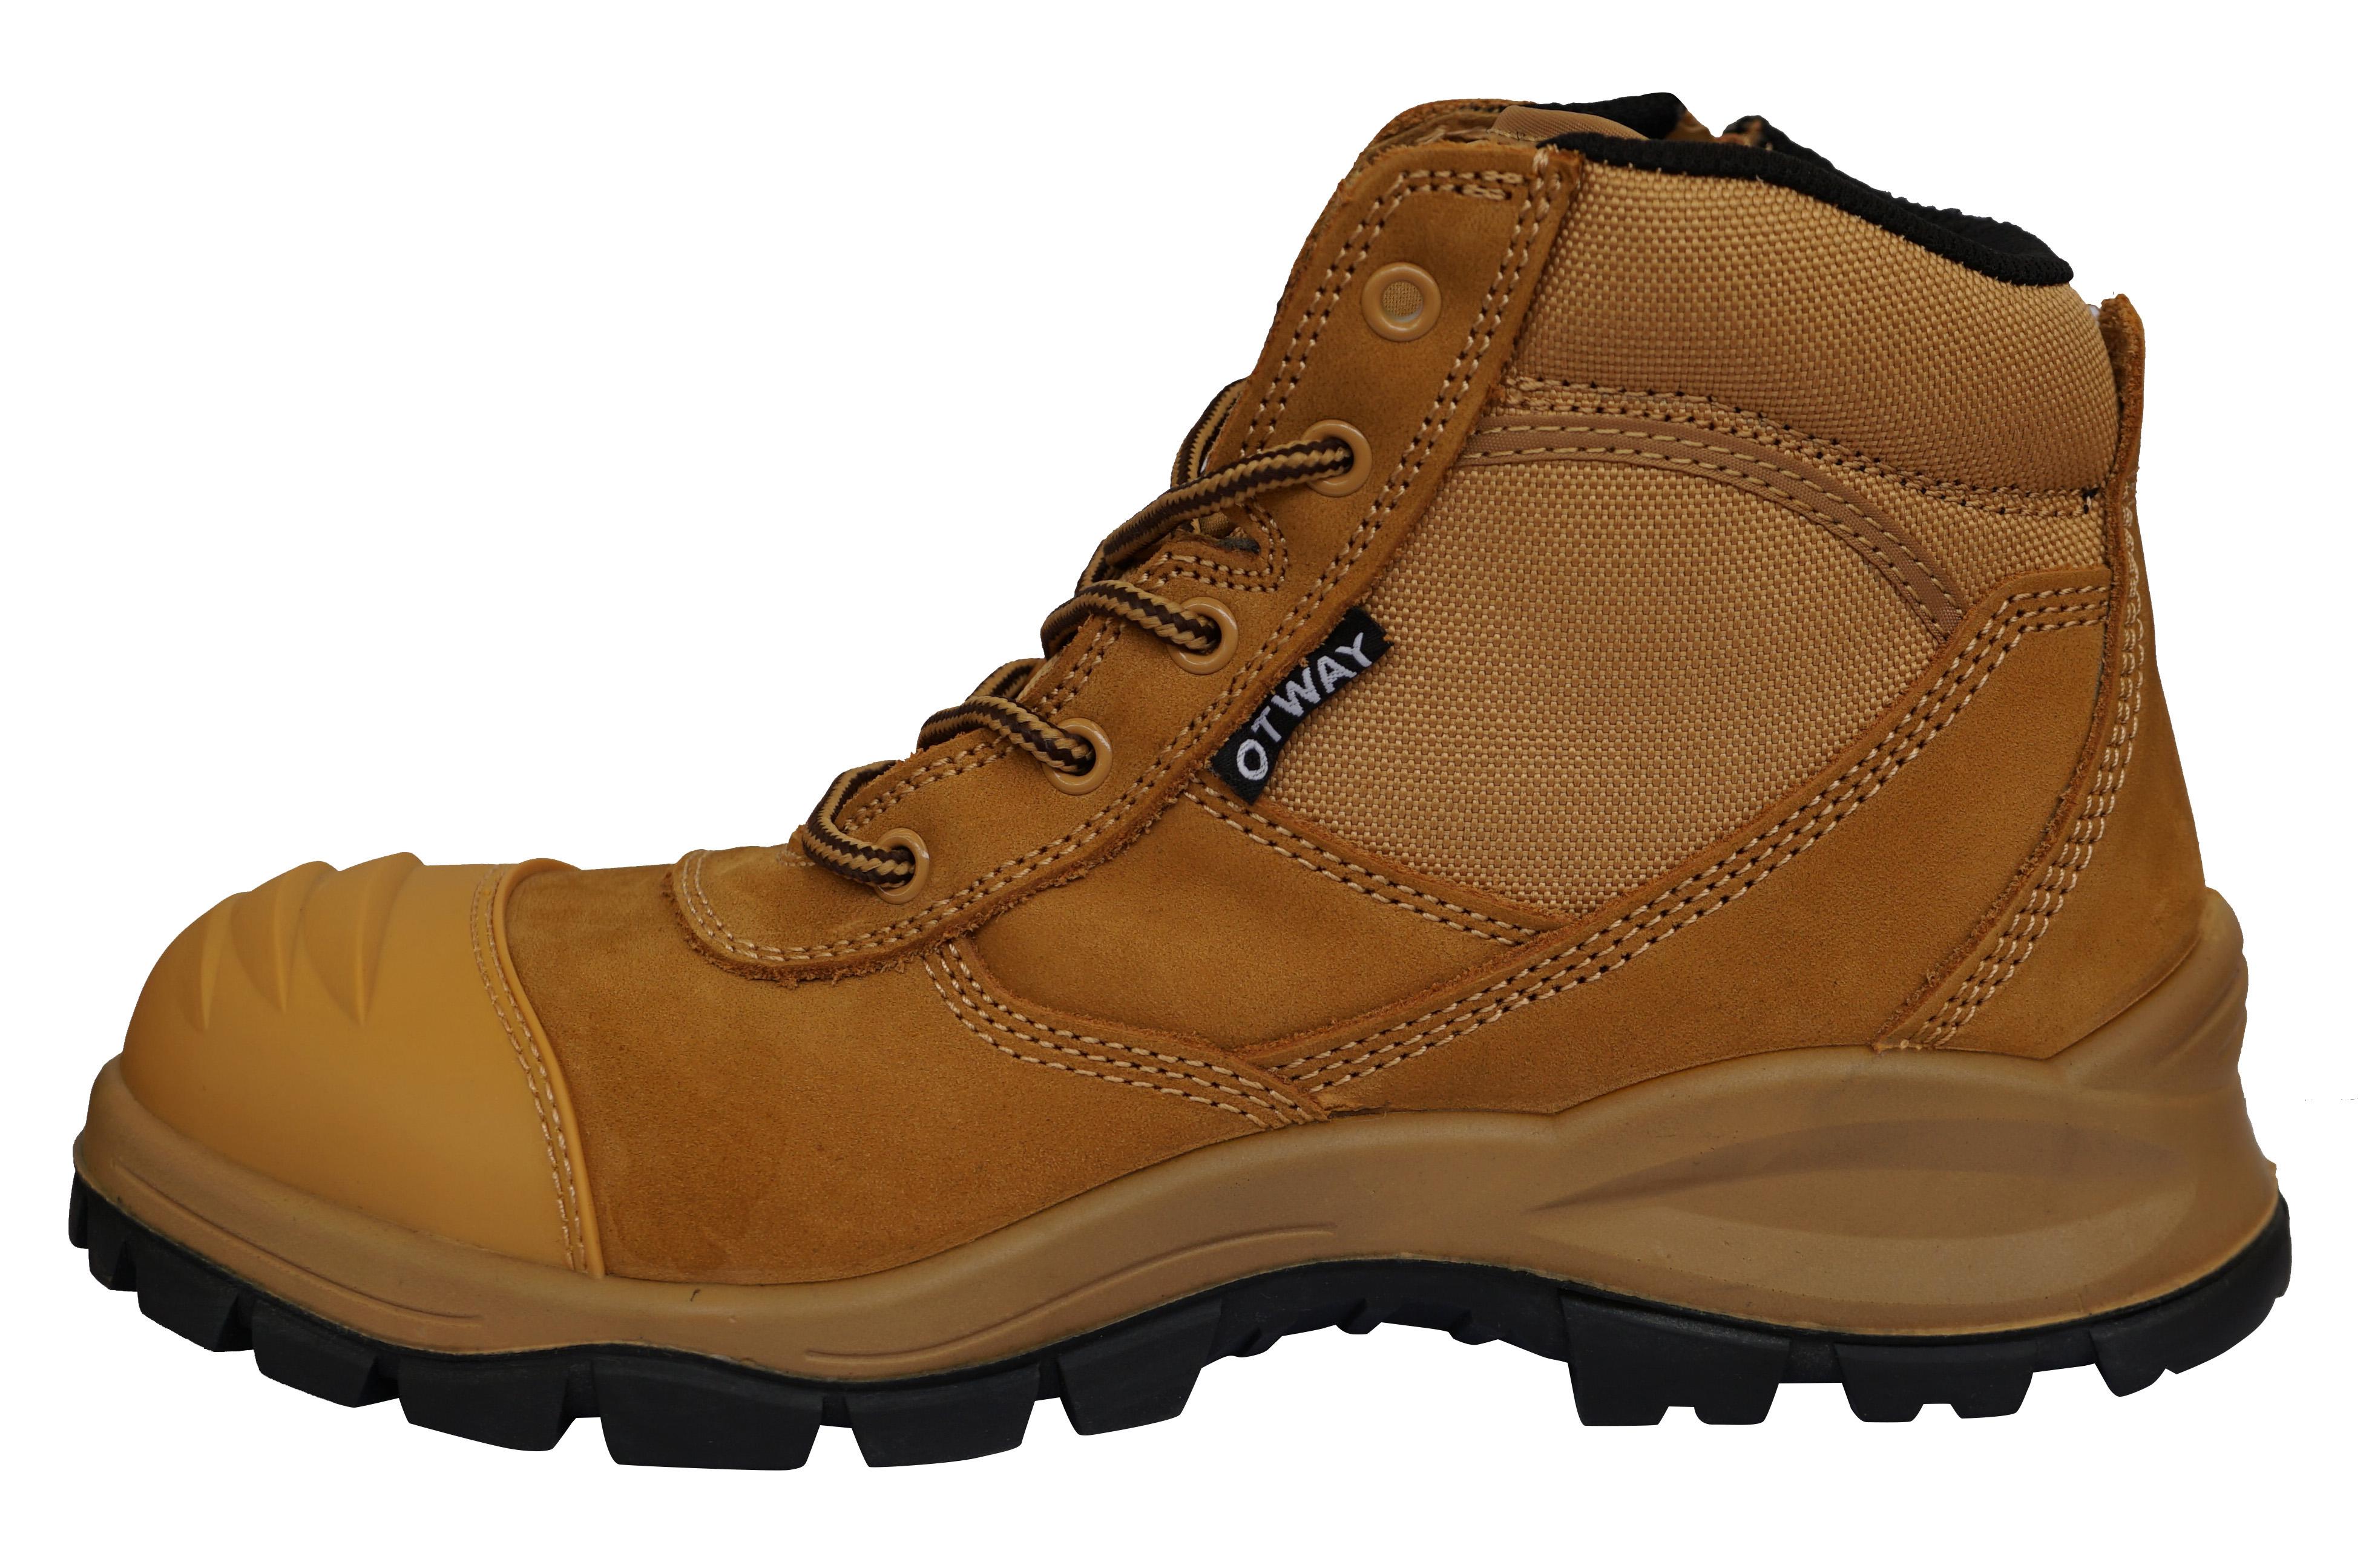 otway men Otwayfootwearcomau contact us for otway men & women boots wholesale - otway footwear otwayfootwearcomau men neoprene lined gumboots by otway, wholesale fishing boots for  otwayfootwearcomau neoprene boots, men farm boots, work boots, otway women's.